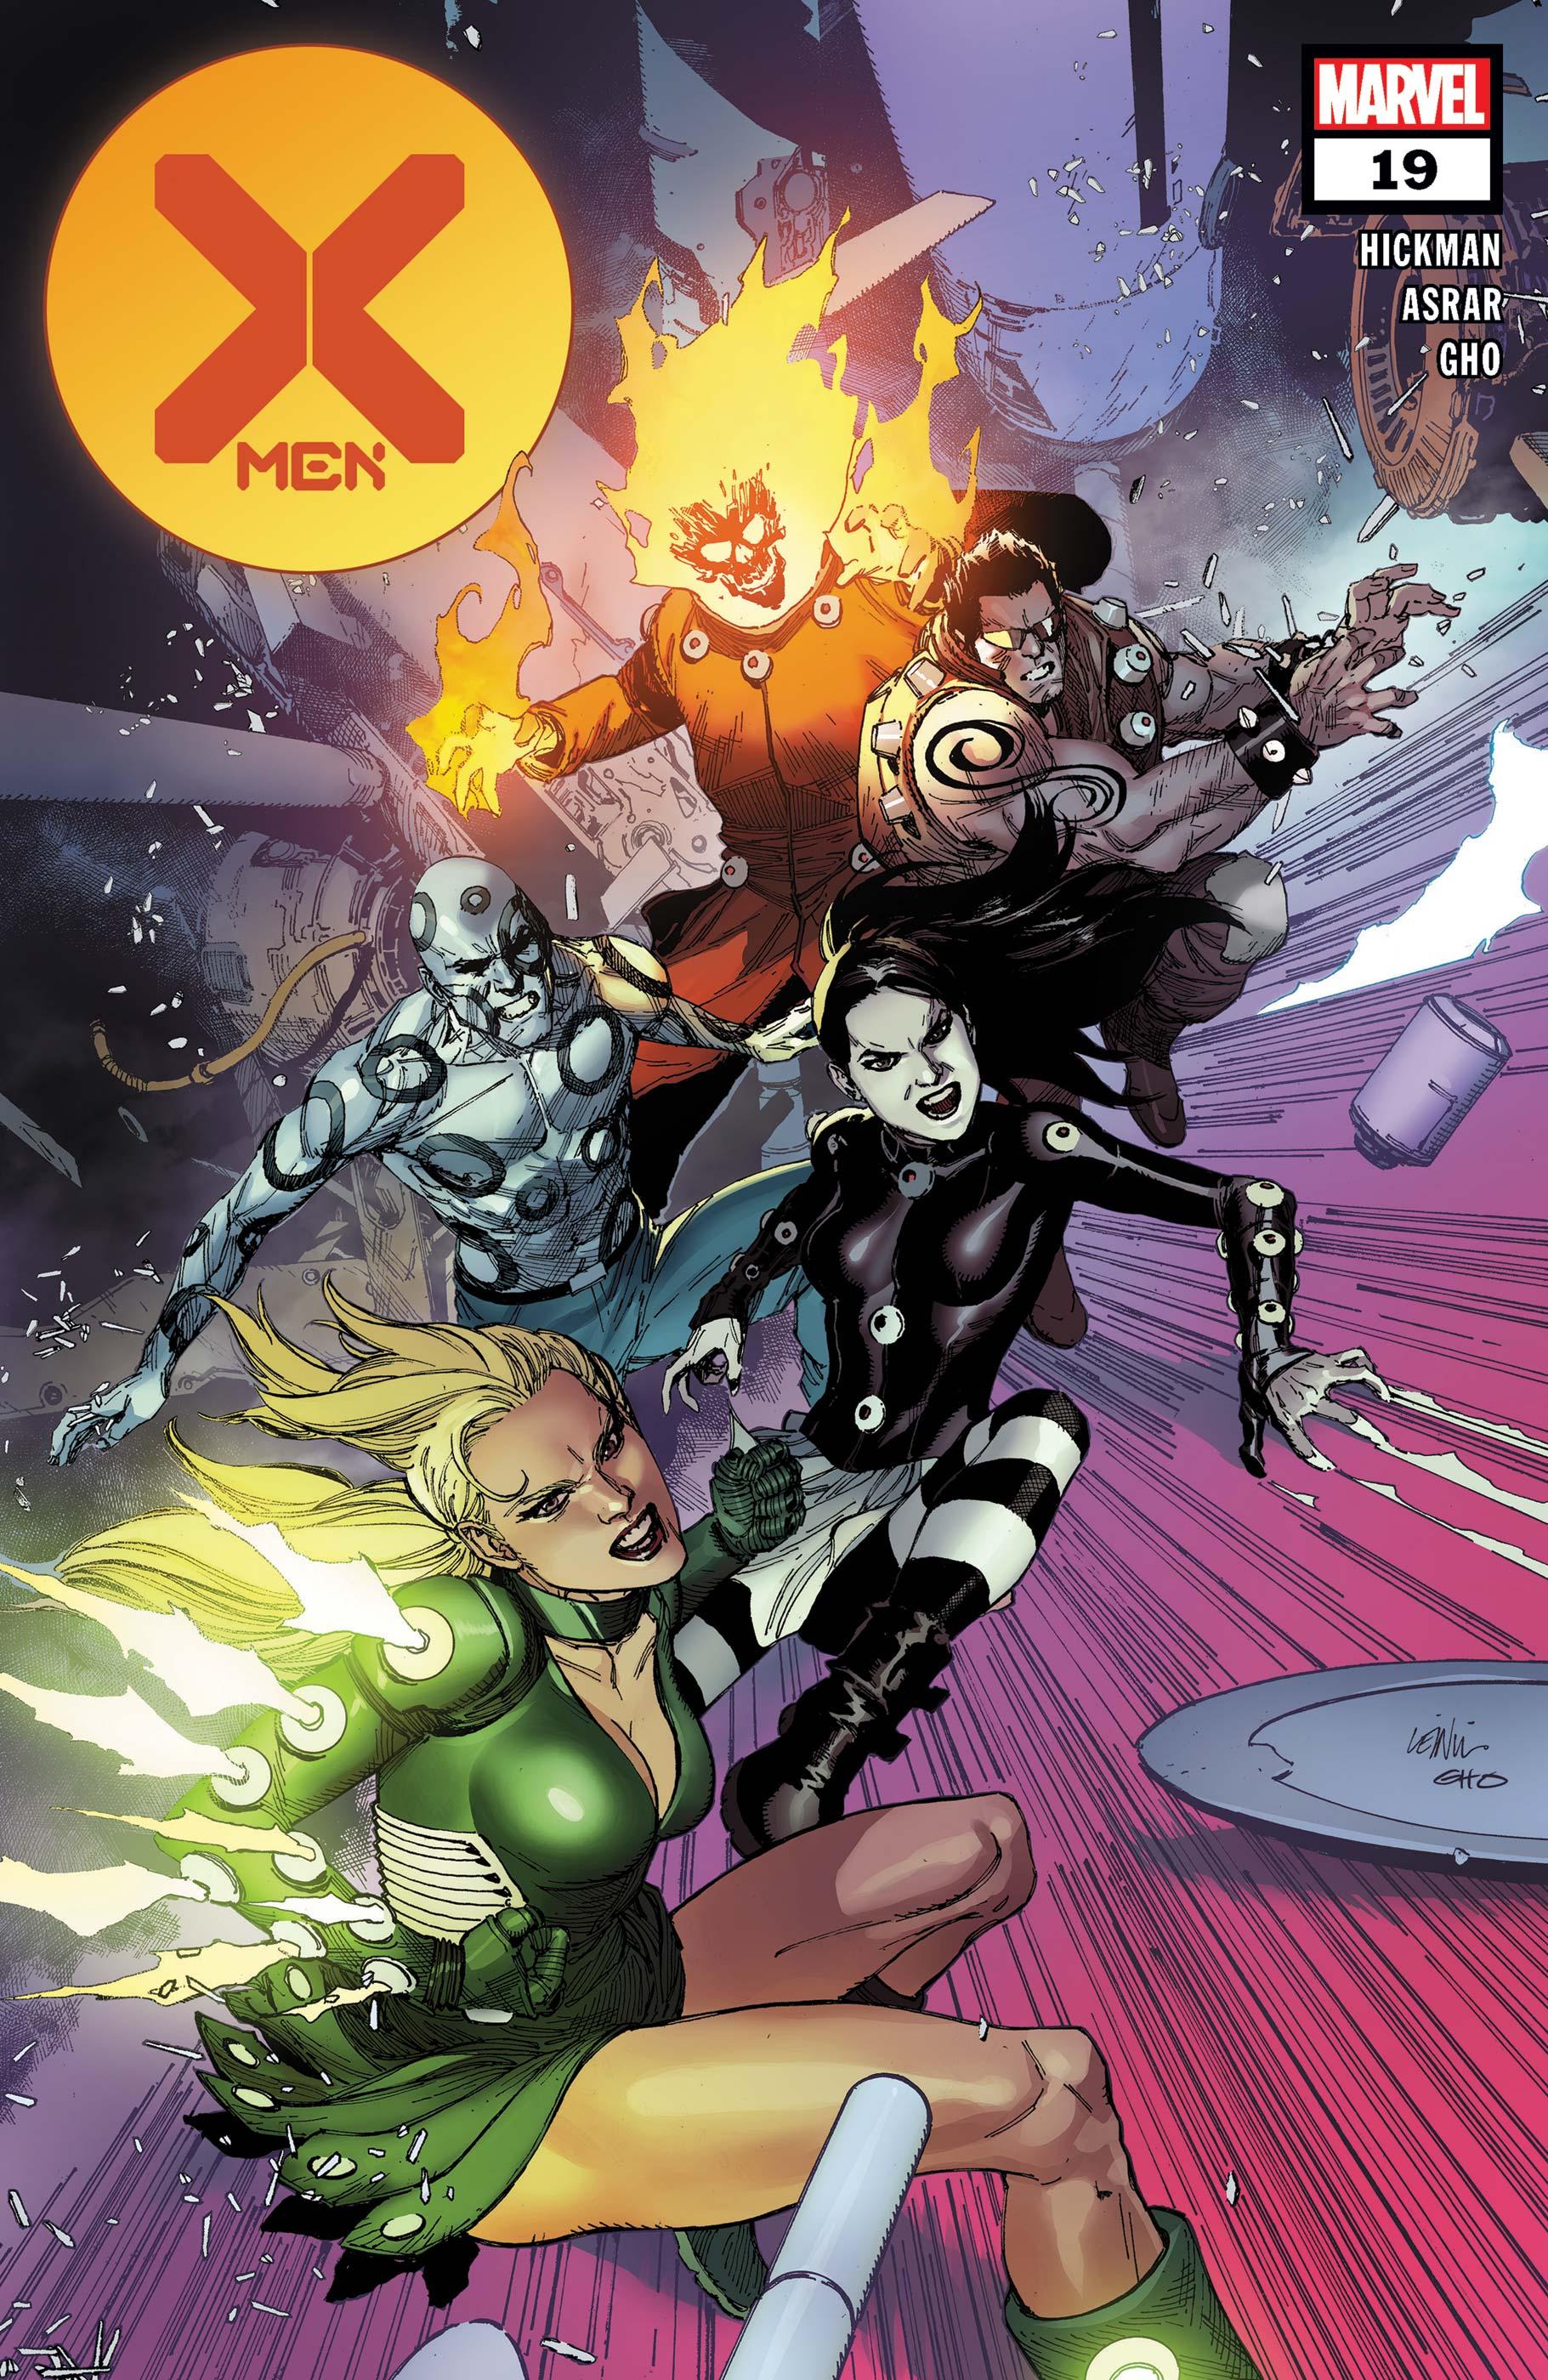 X-Men (2019) #19